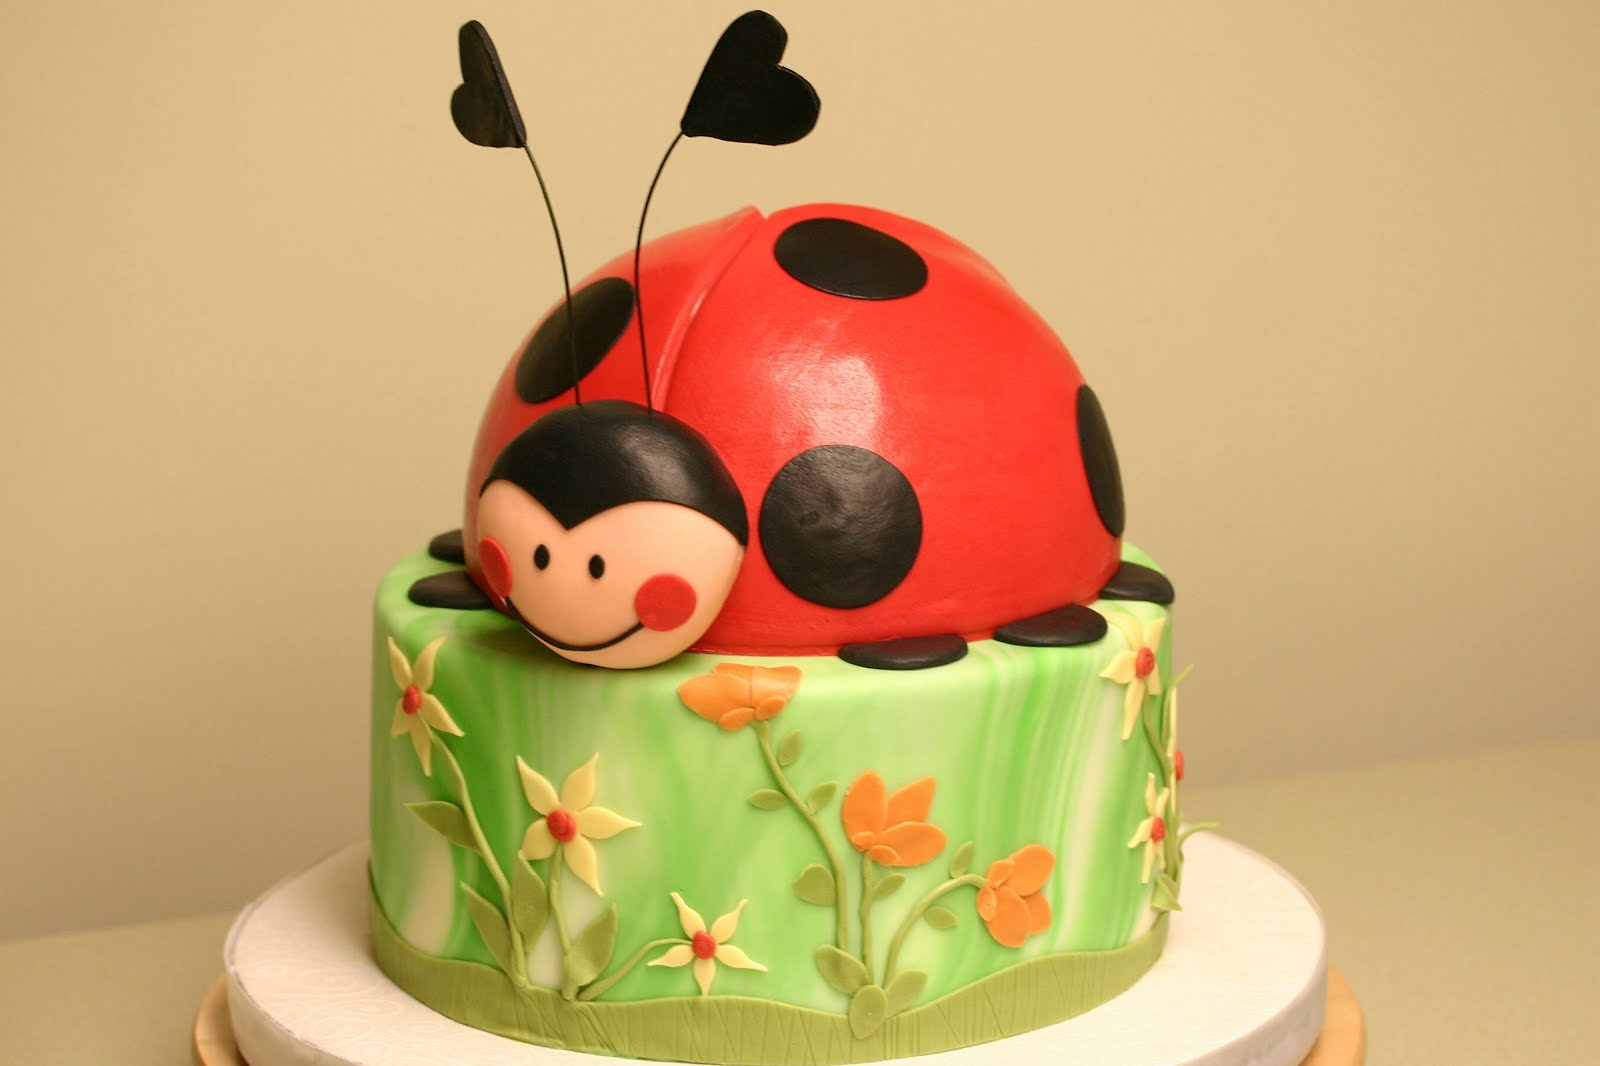 Confectionery Designs: Animated Children's Birthday Cakes